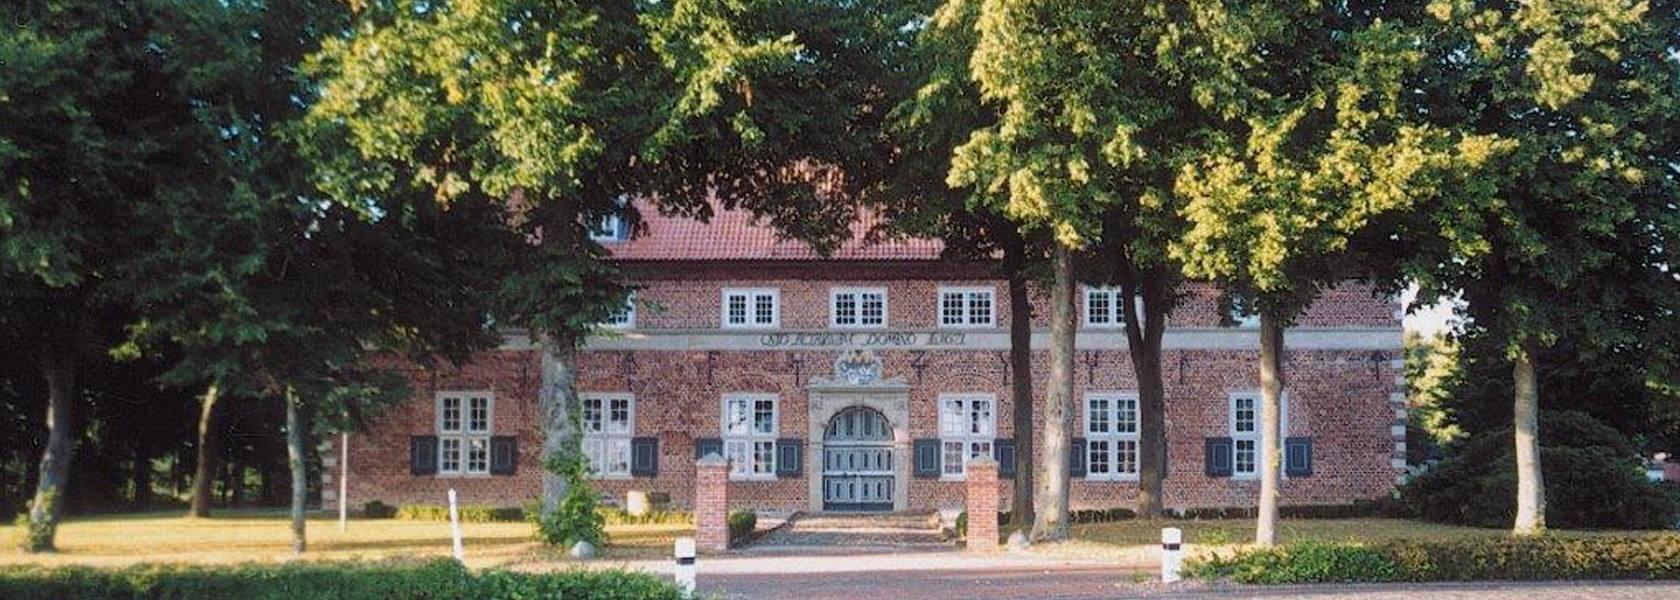 Waisenhaus, © Kurverwaltung Nordseebad Dangast